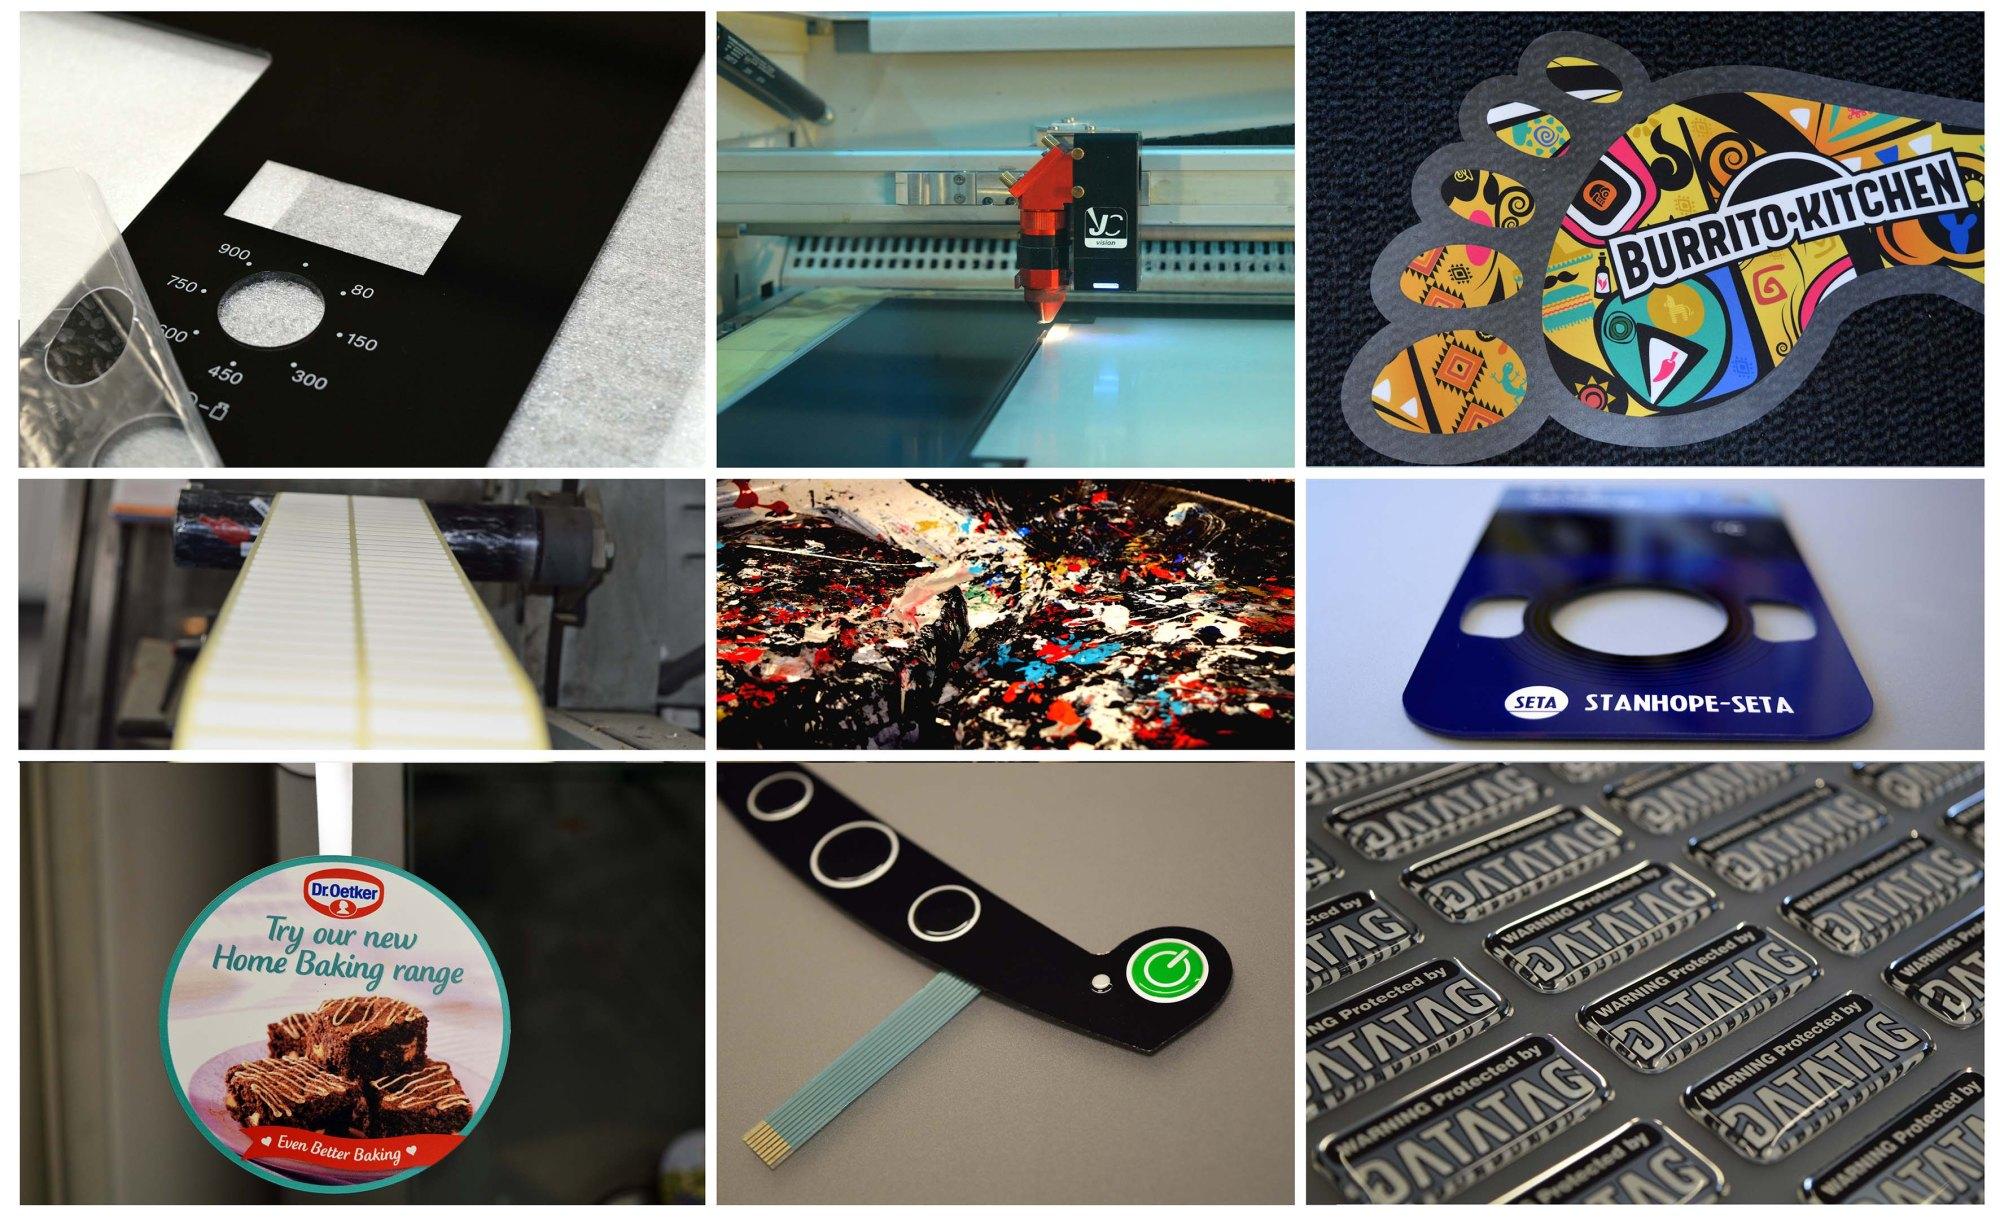 Customark's range of products